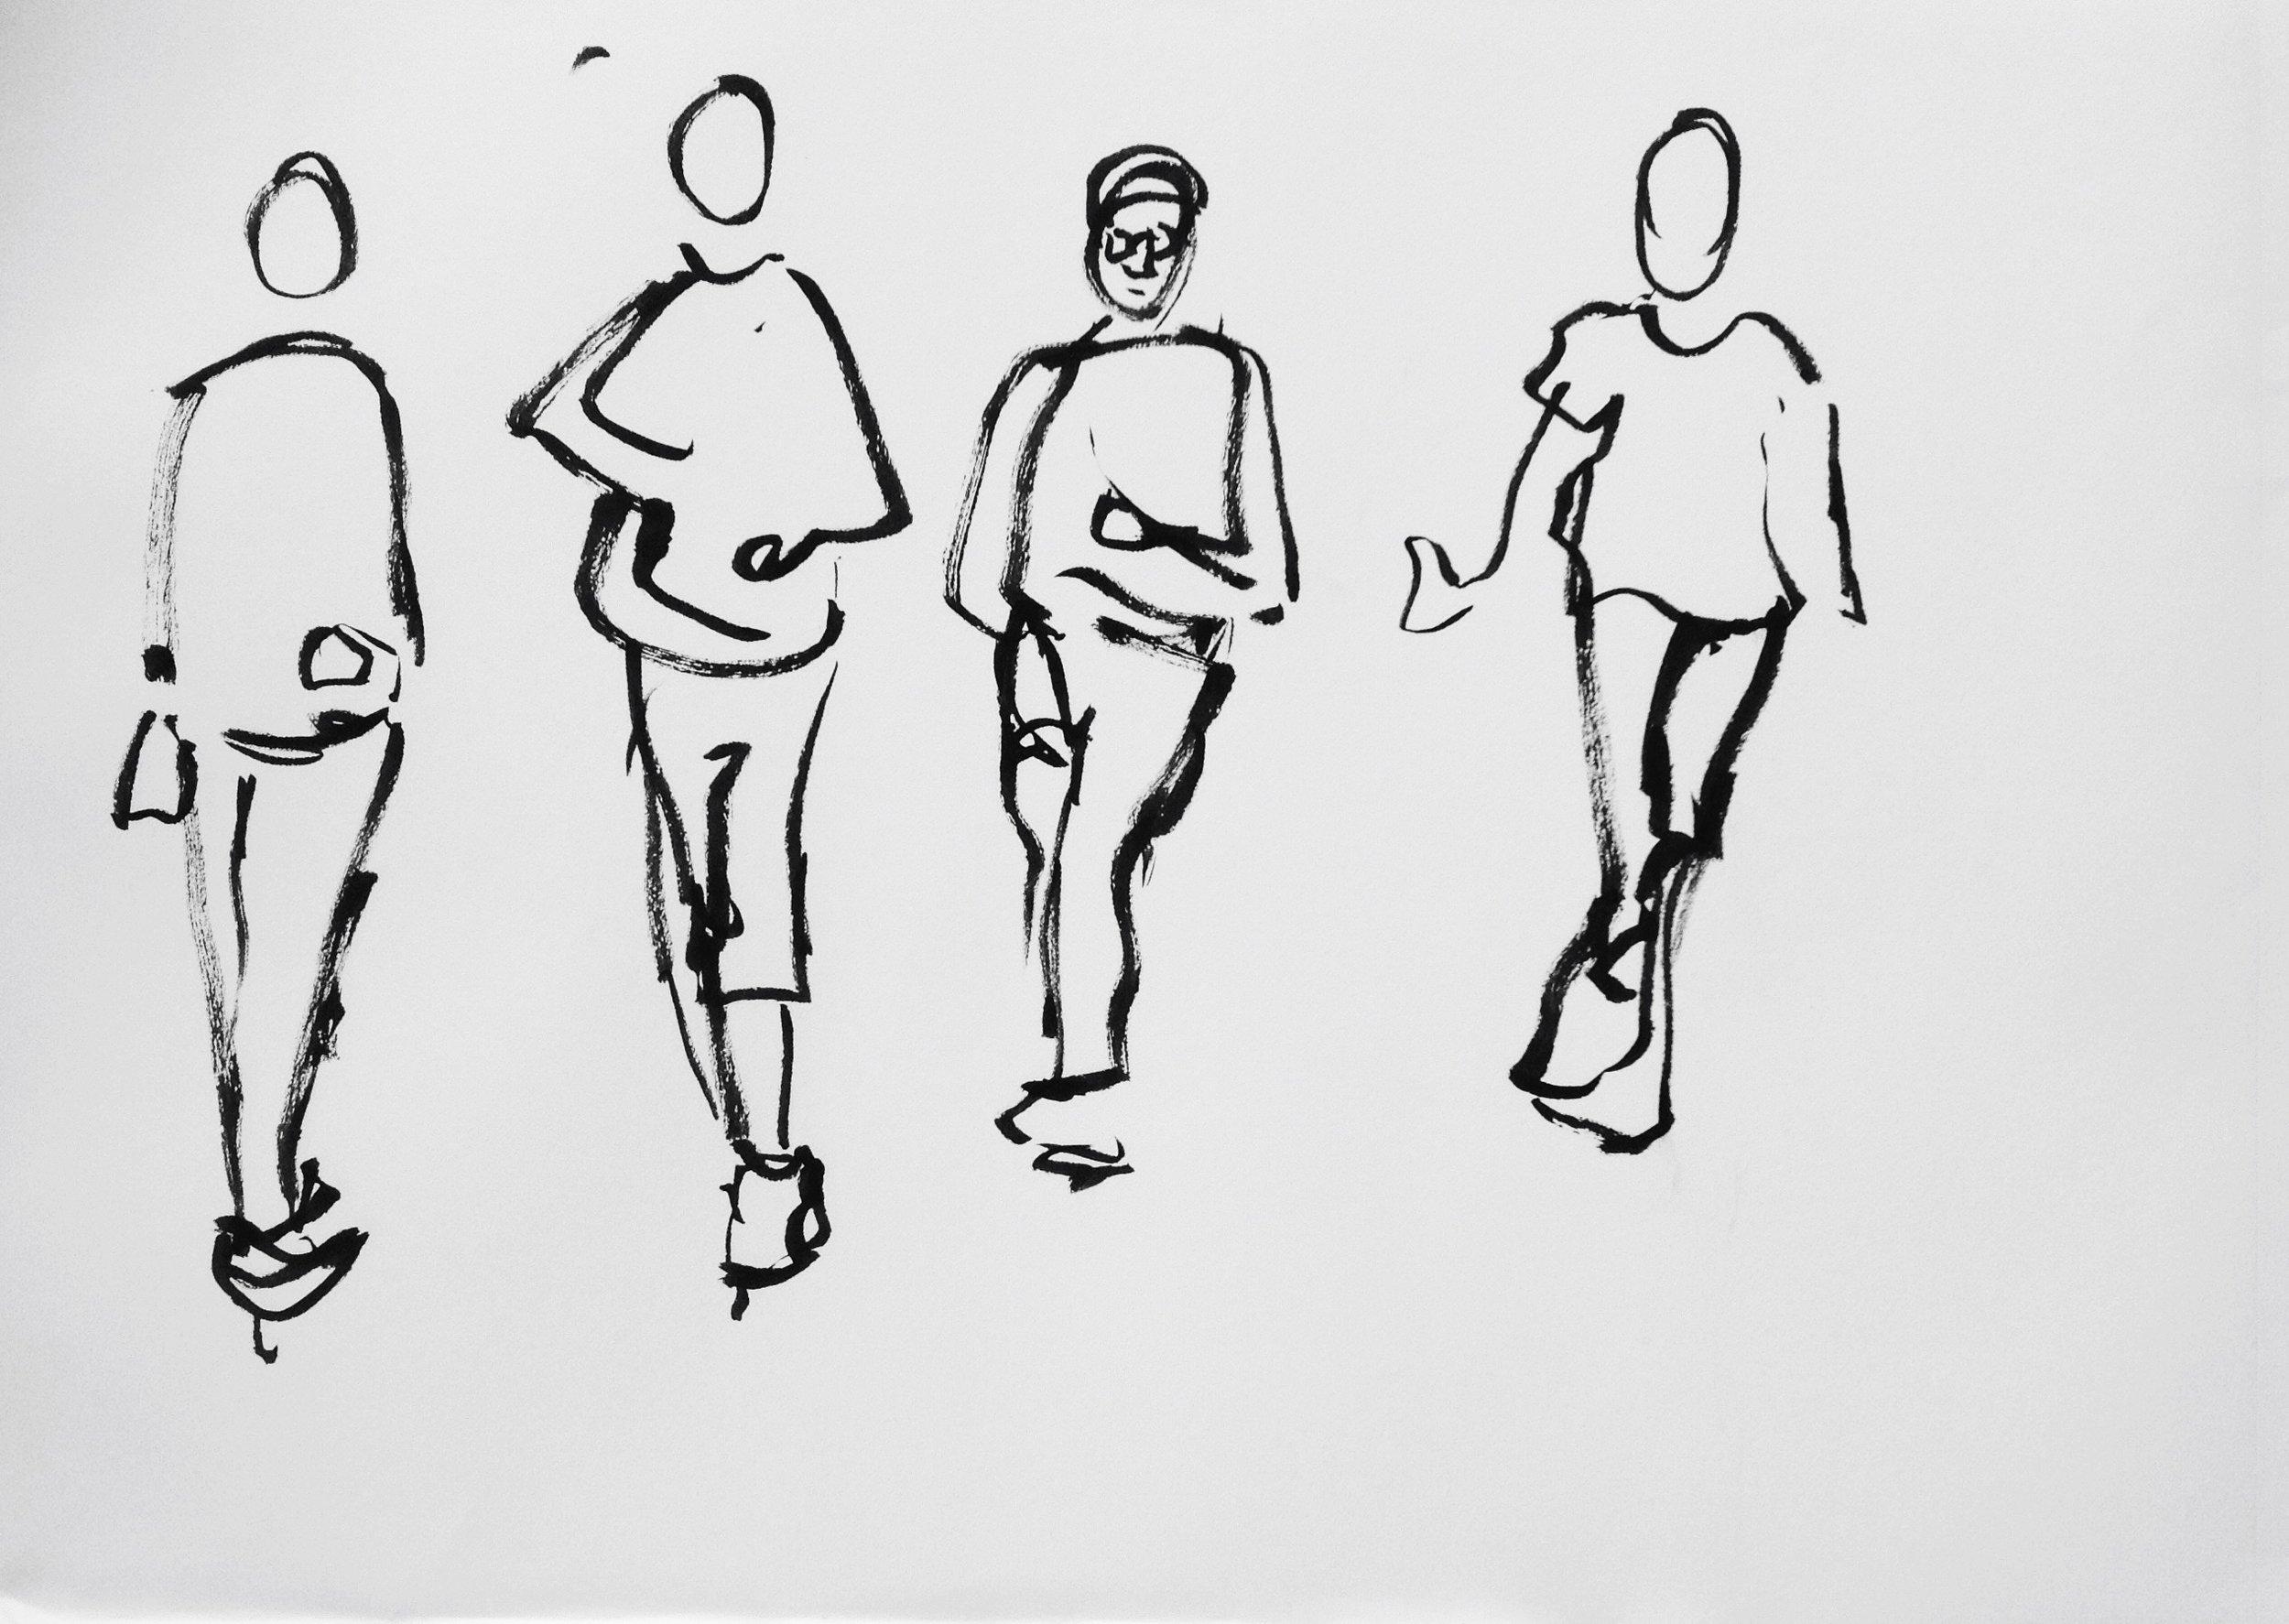 runnergroup4